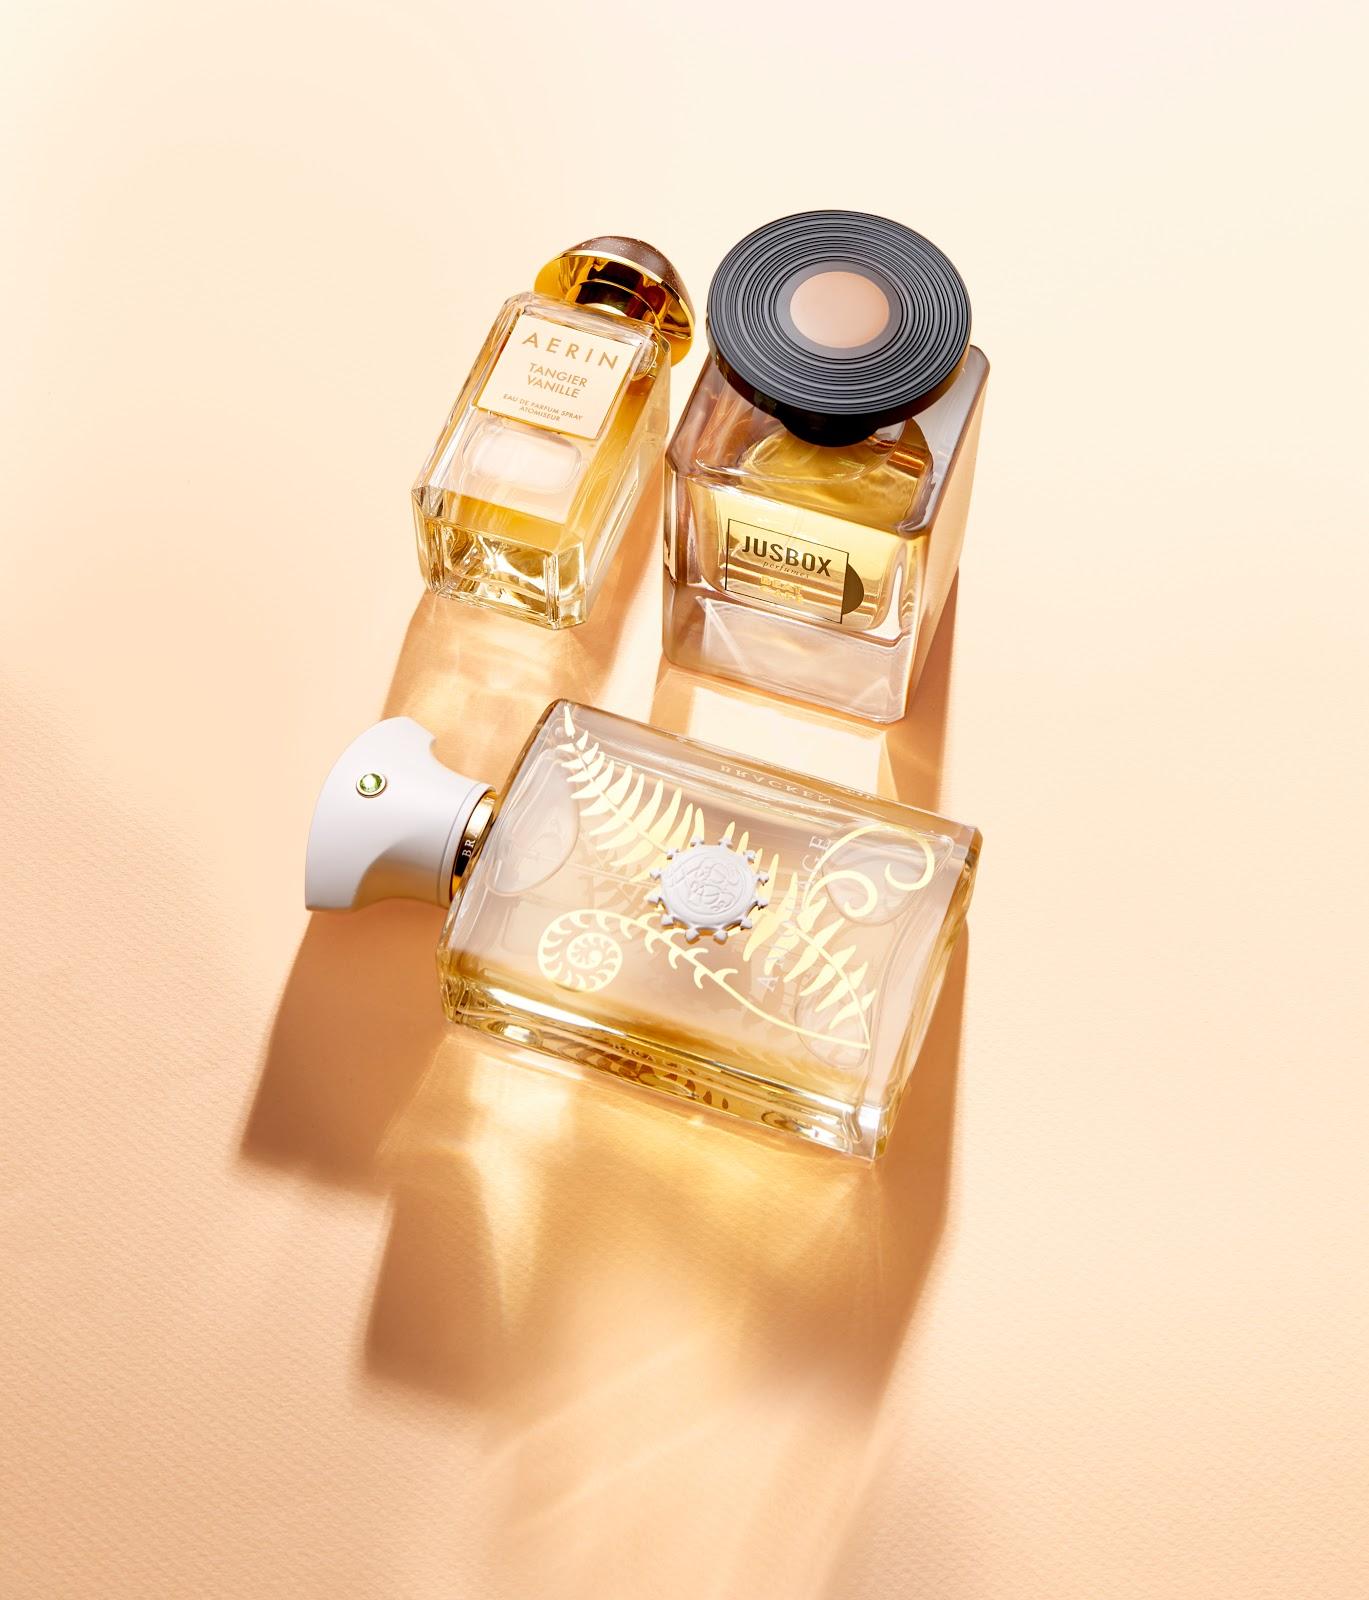 Zuki_Turner_Creative Direction_RED Perfume SPICE.jpg